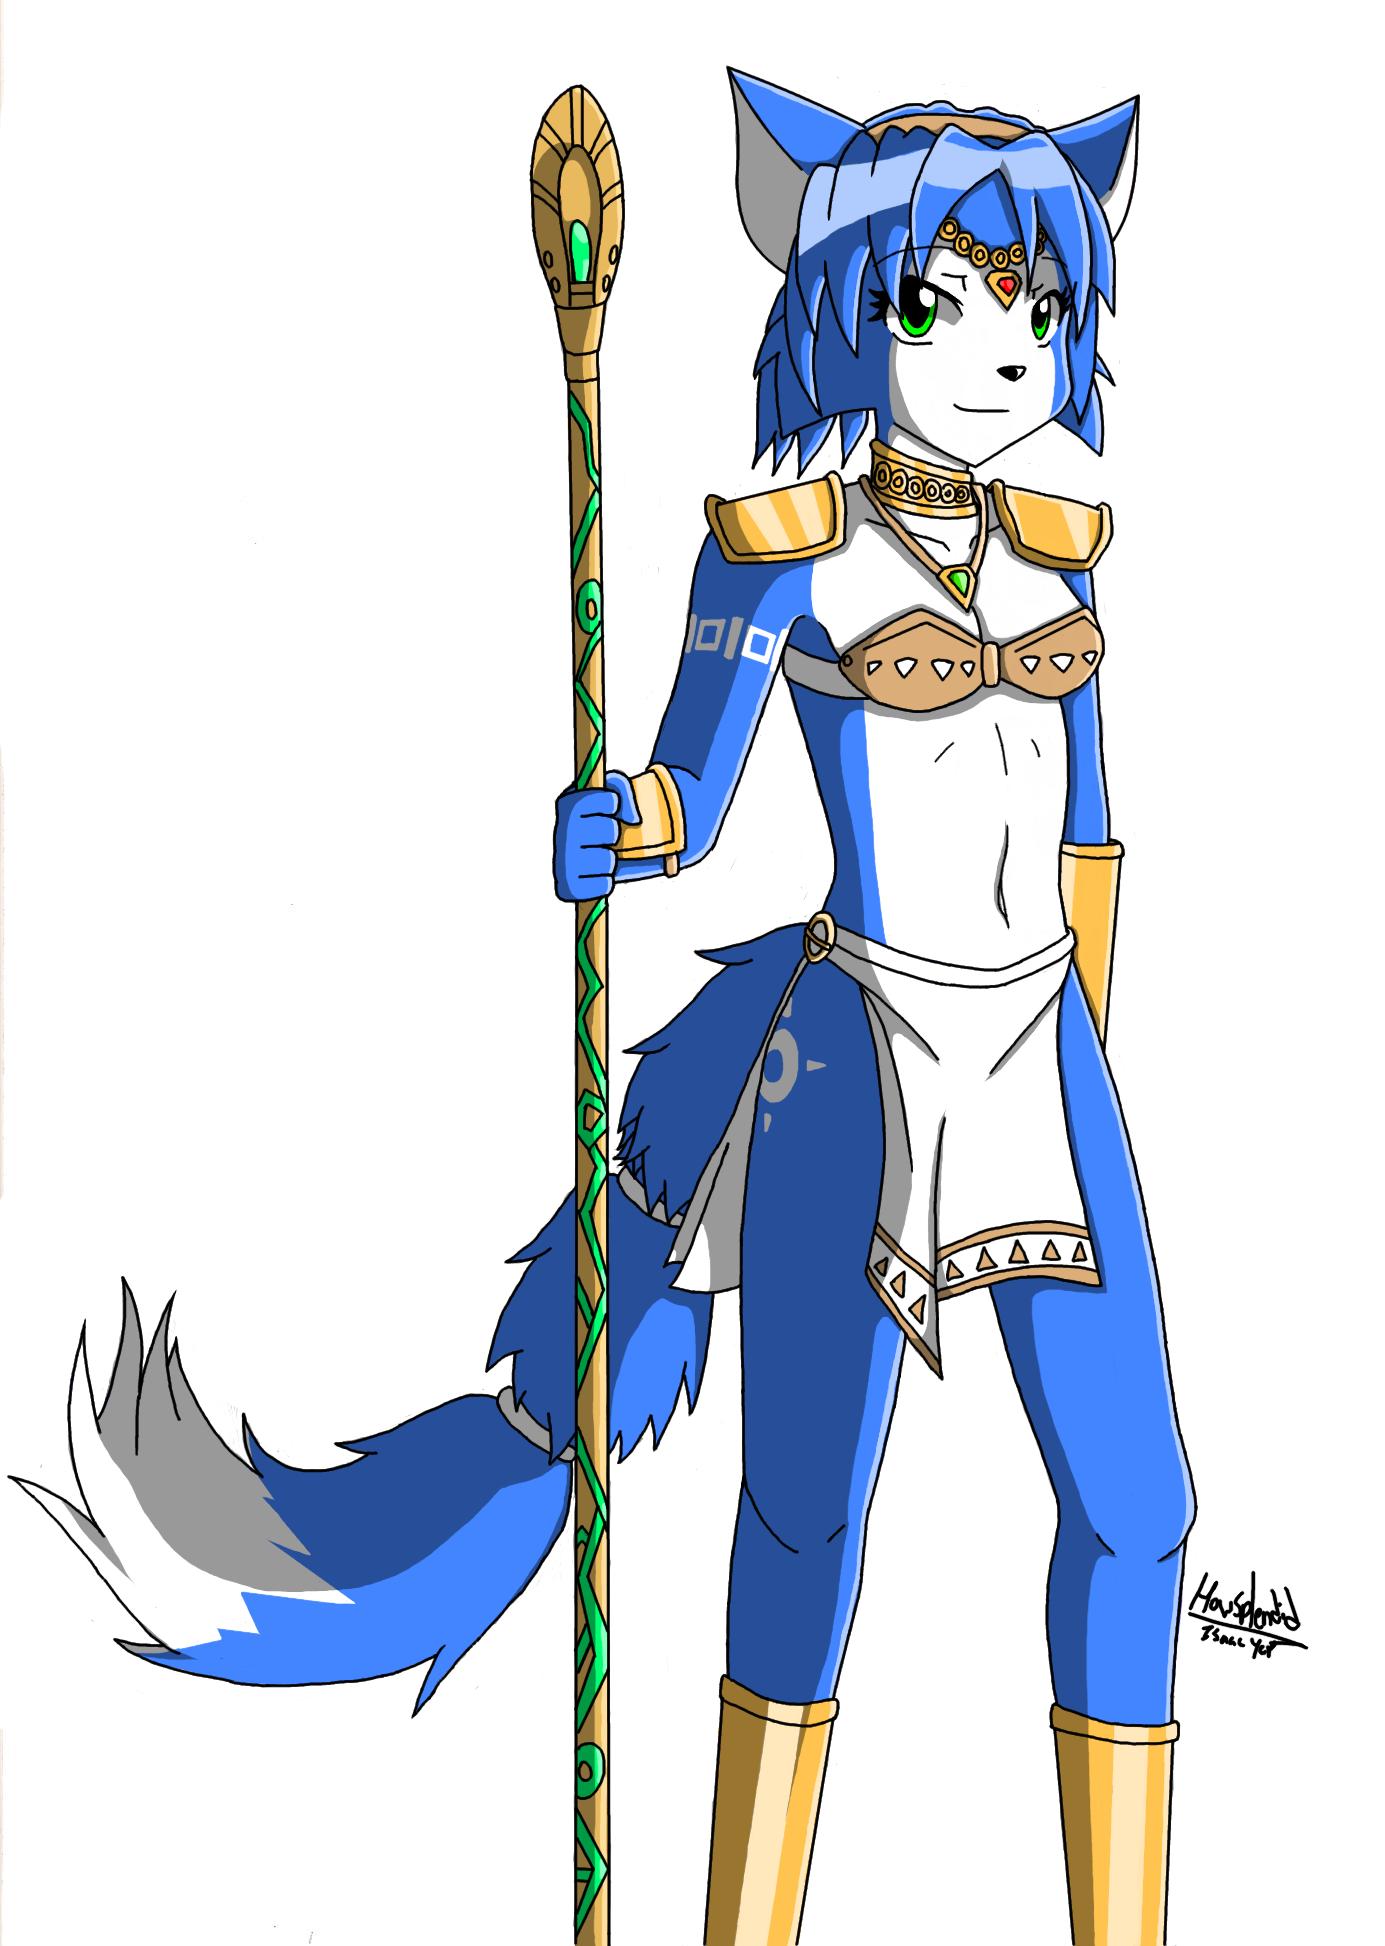 Krystal the Fox